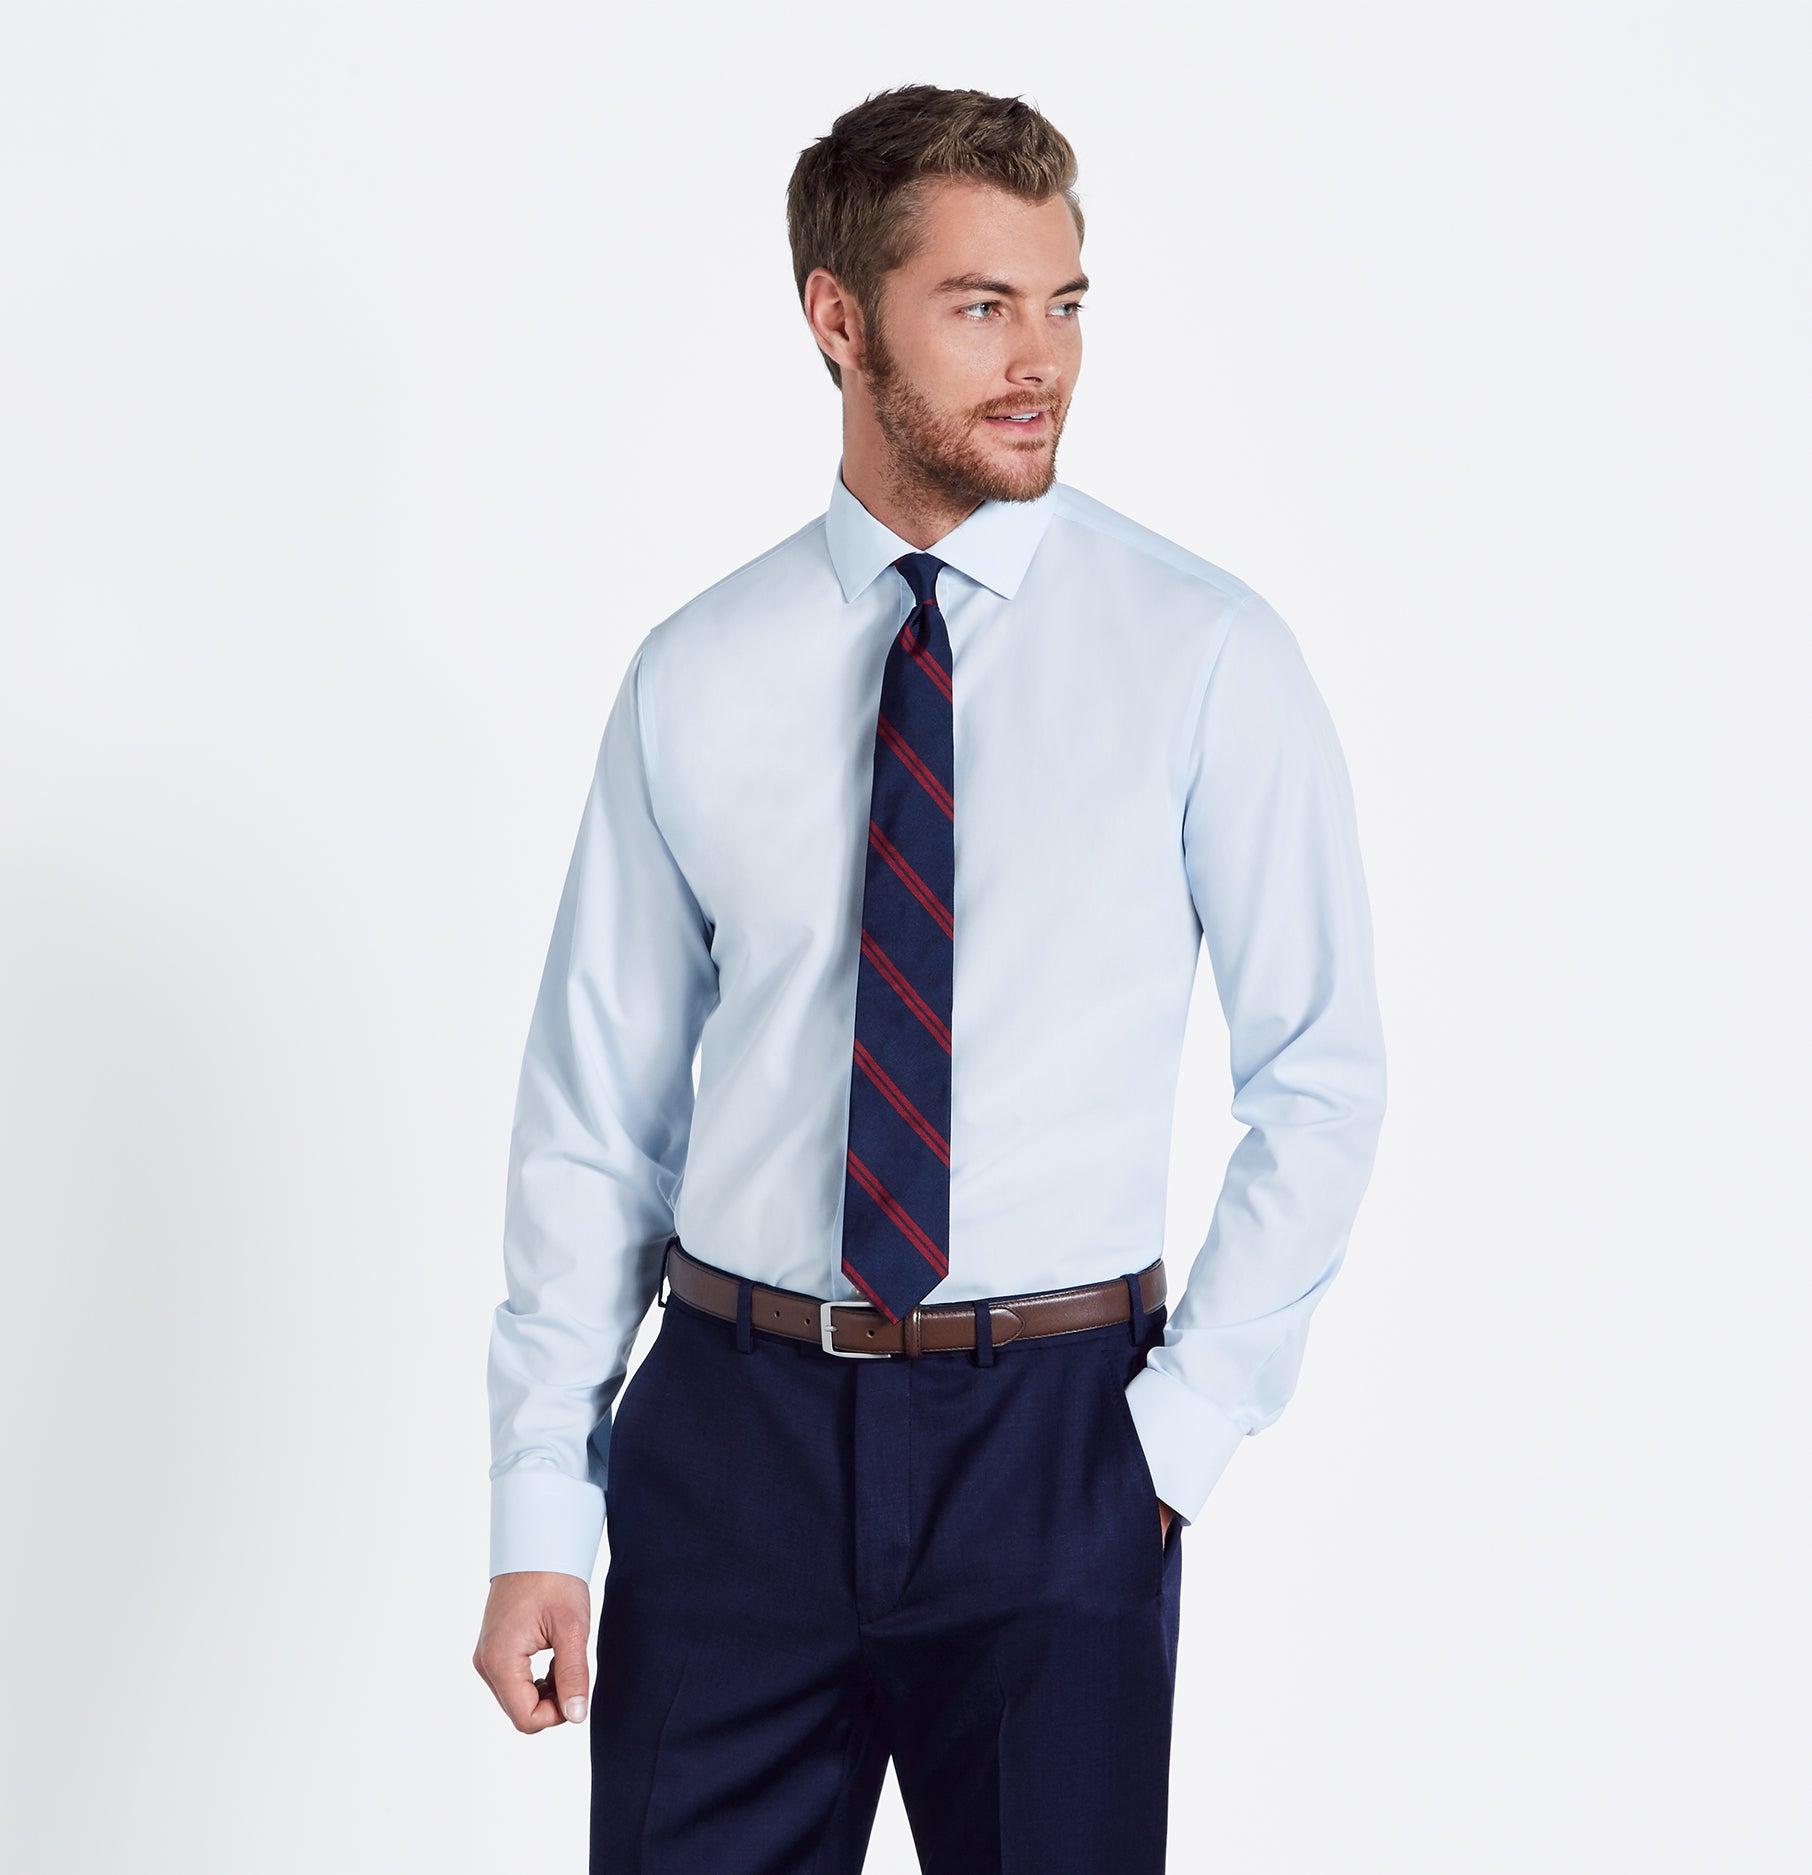 Blue dress shirt white tie